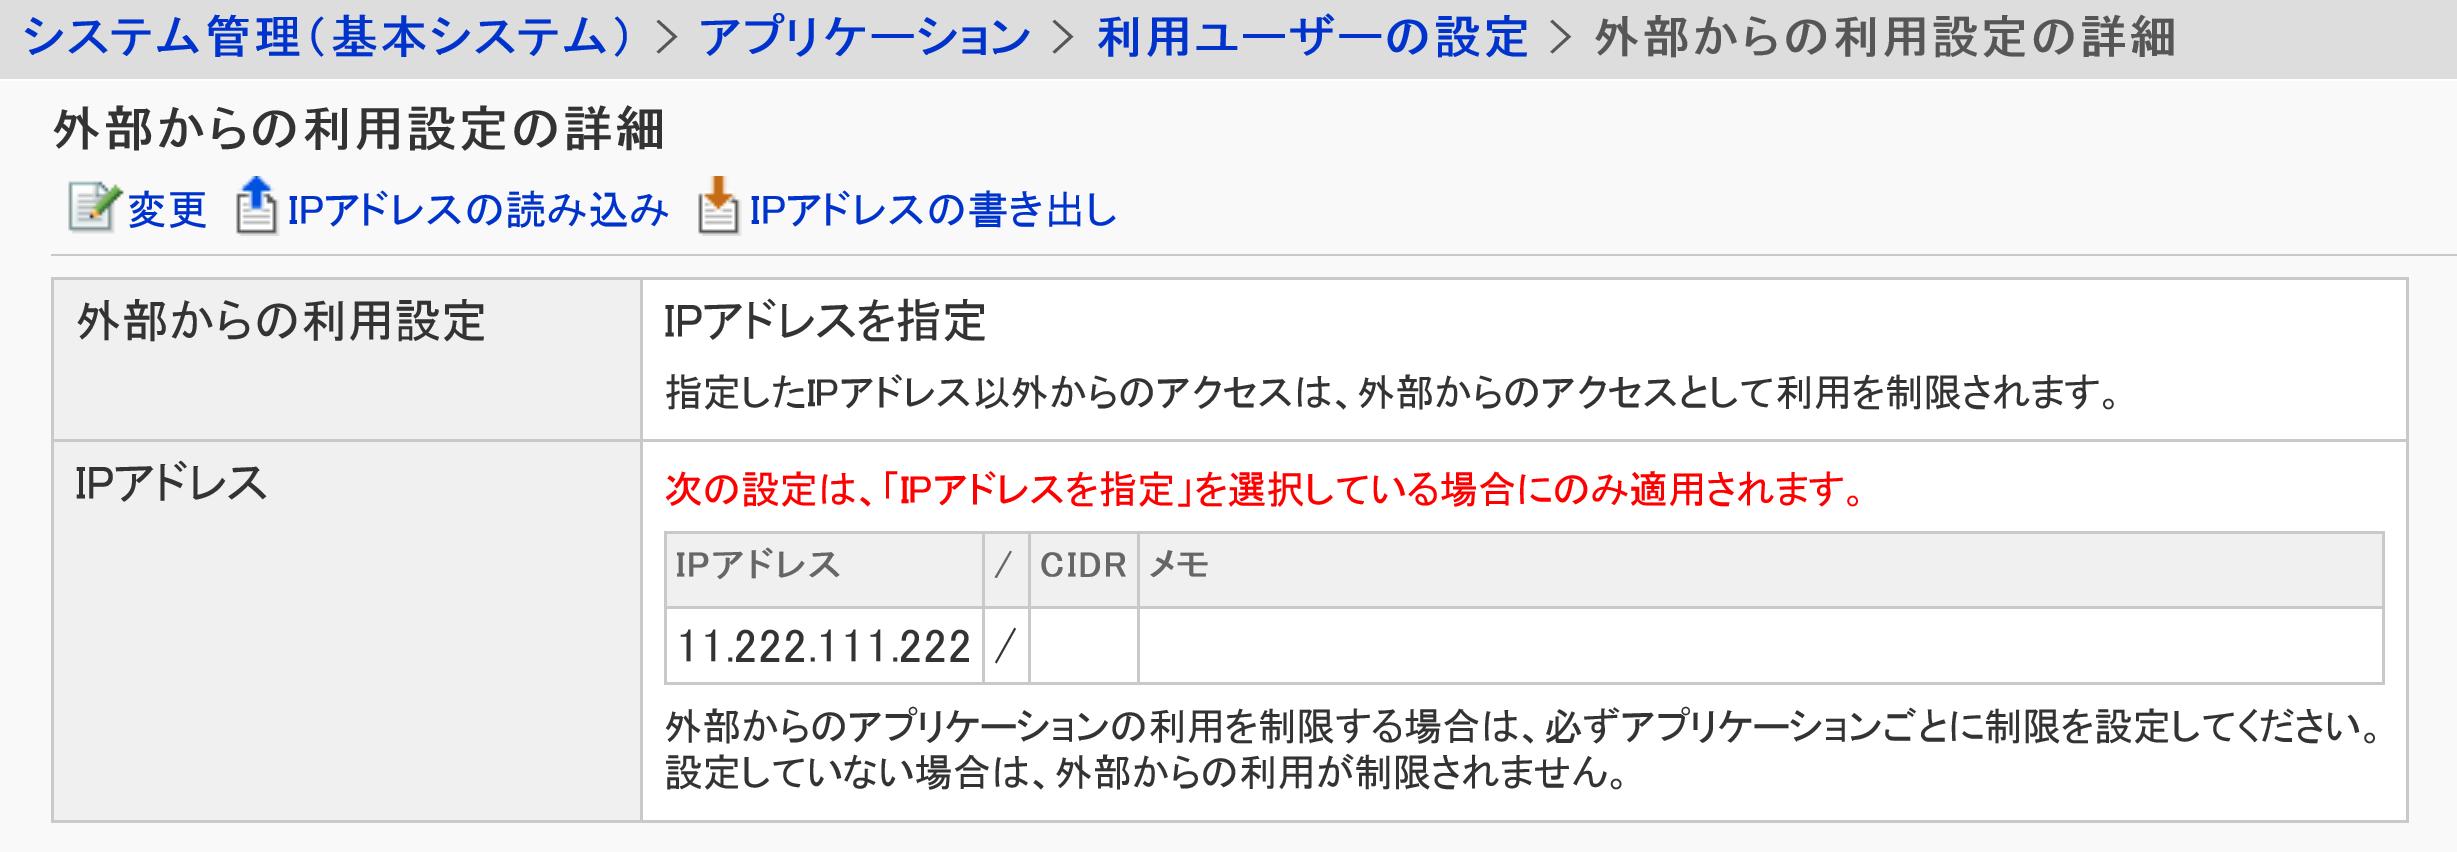 https://enterprise.cybozu.co.jp/18059459aca9a38a41b71c62bc8367a92e4ad39a.png